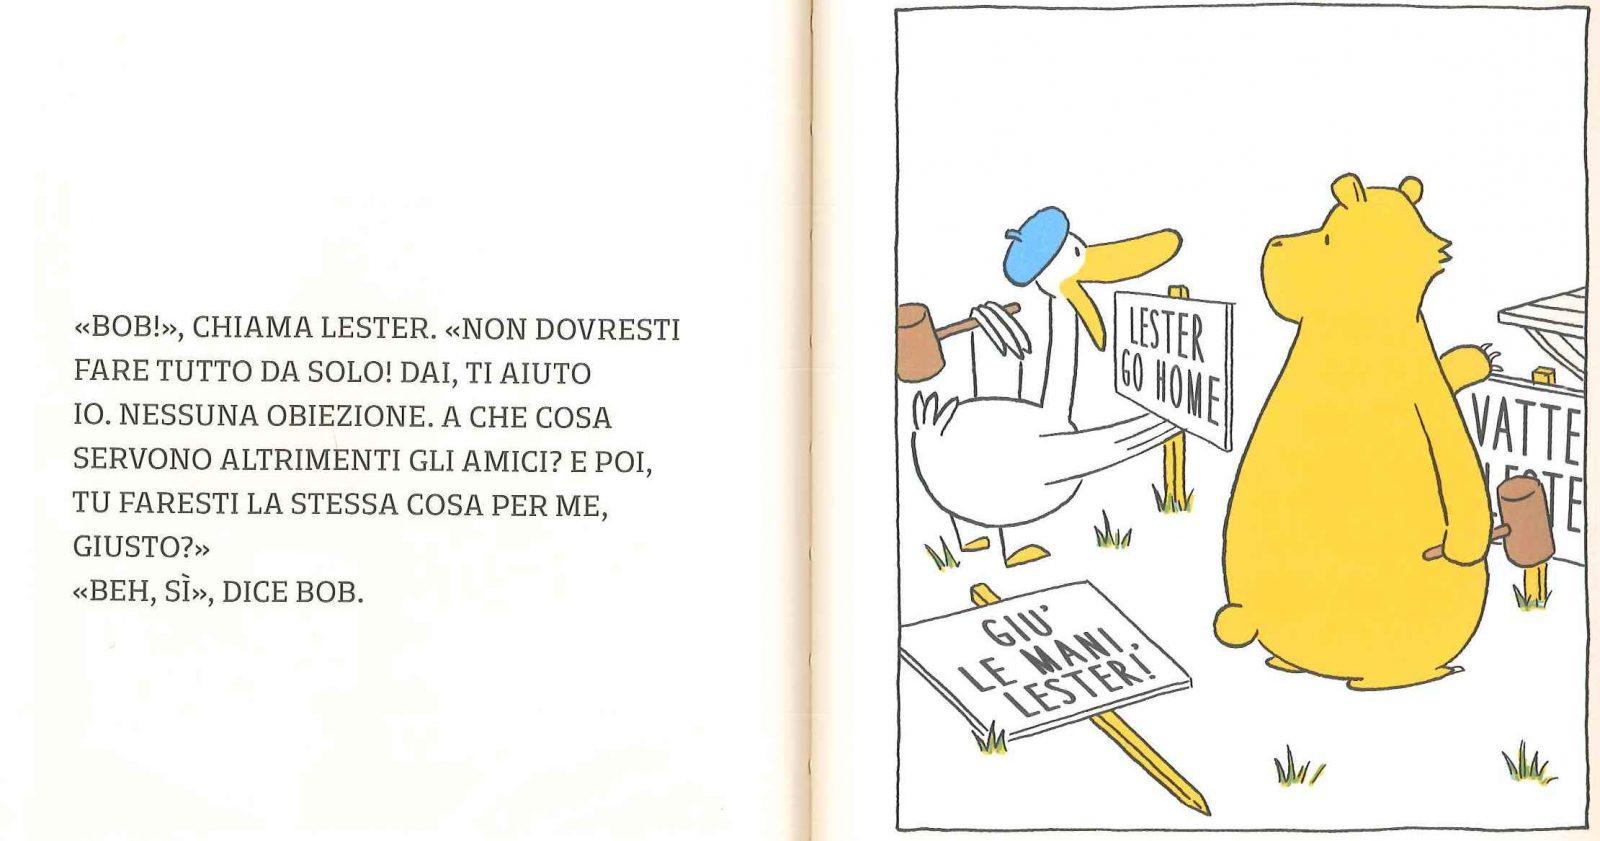 Le avventure di Lester e Bob - Könnecke Ole - Beisler Editore